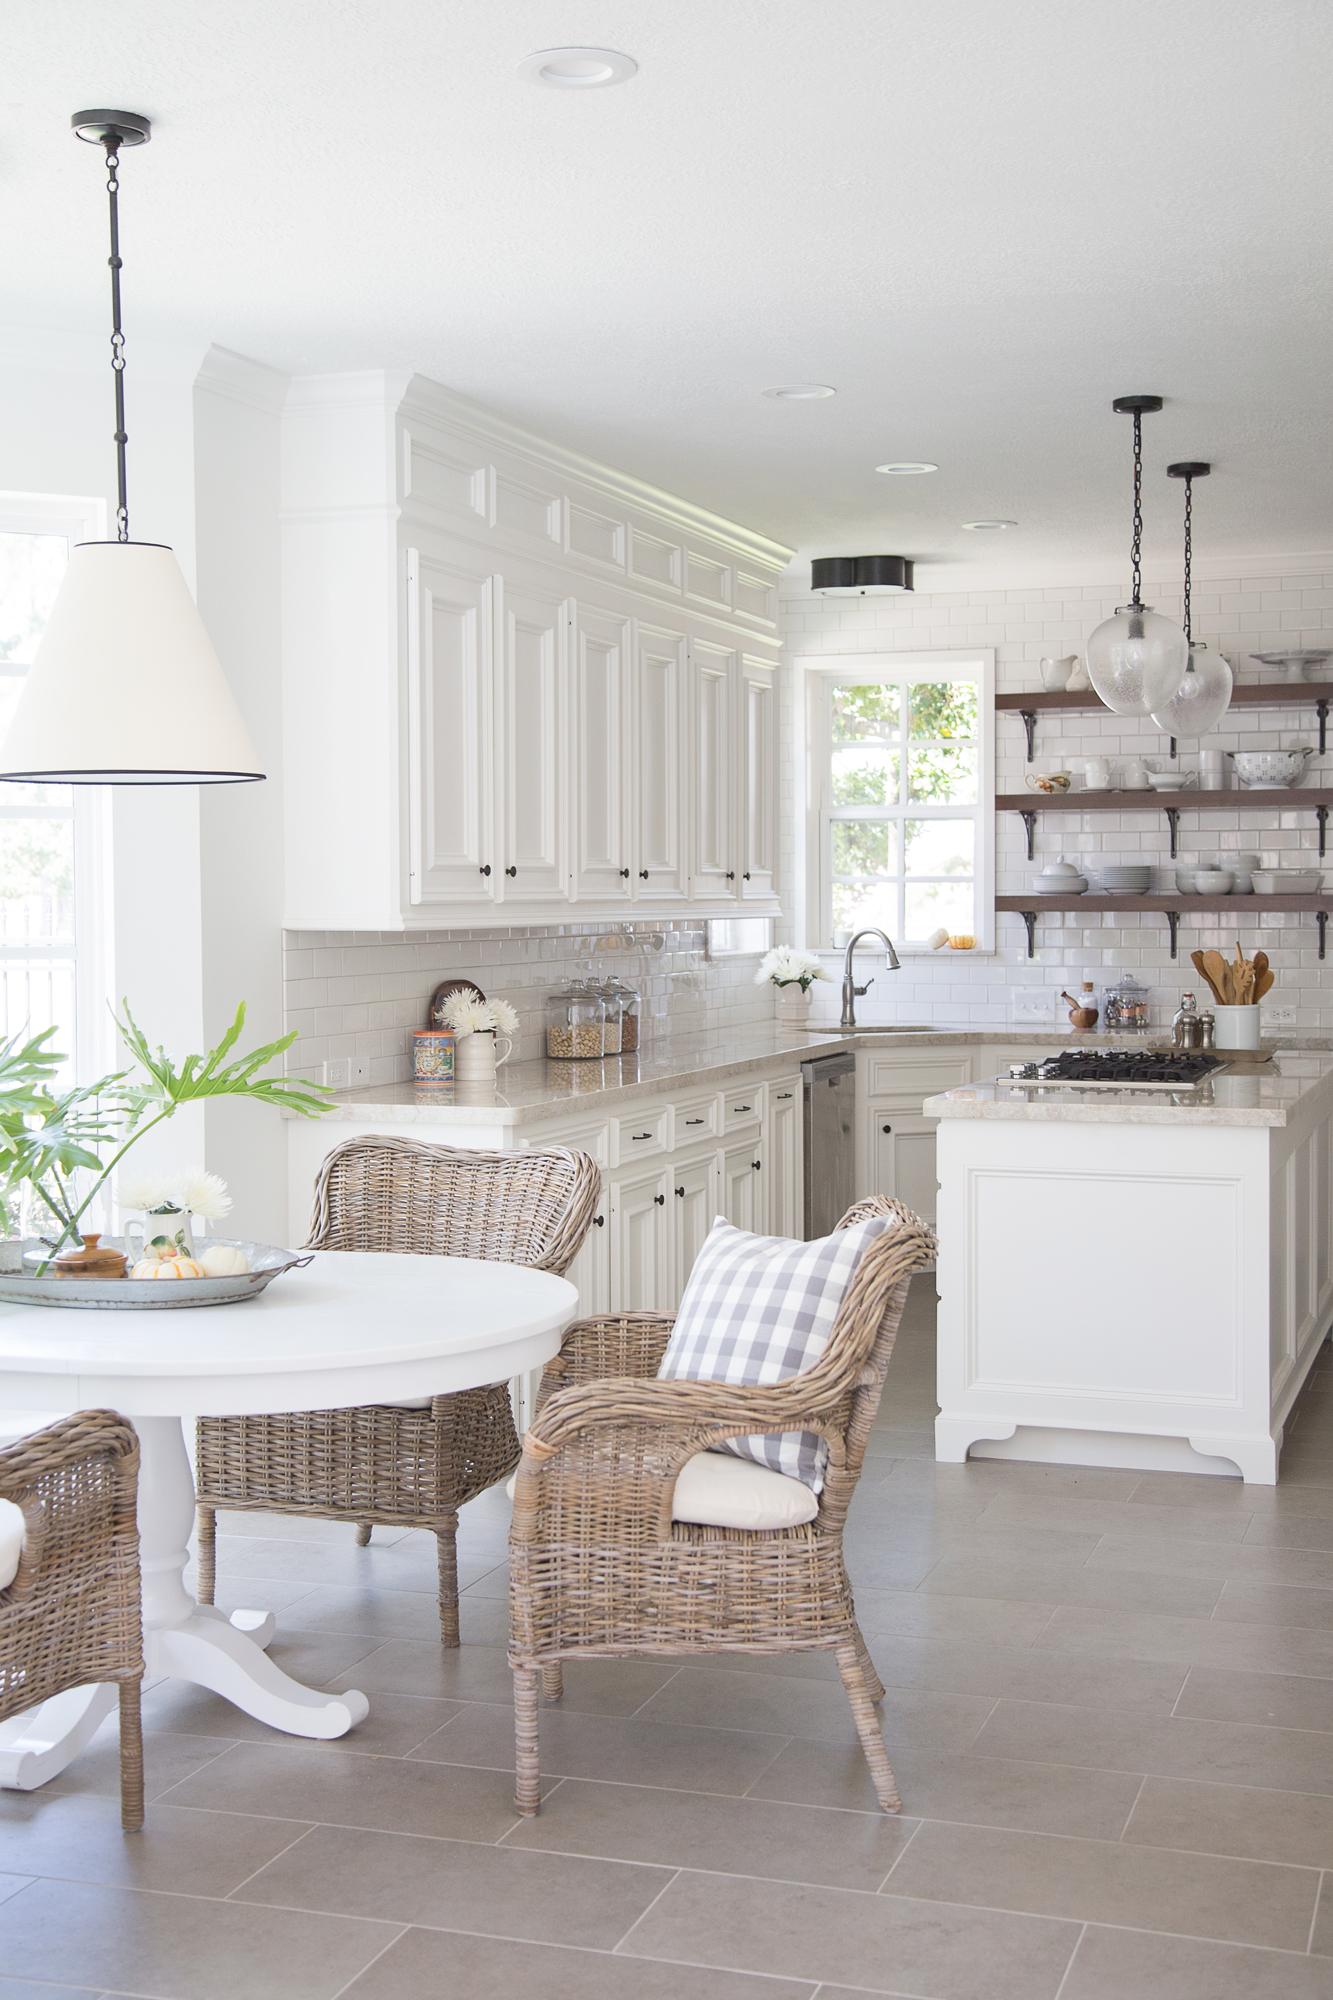 Kitchen Remodel - Dark, Dismal Kitchen Gets A Light Bright Makeover, Designer: Carla Aston